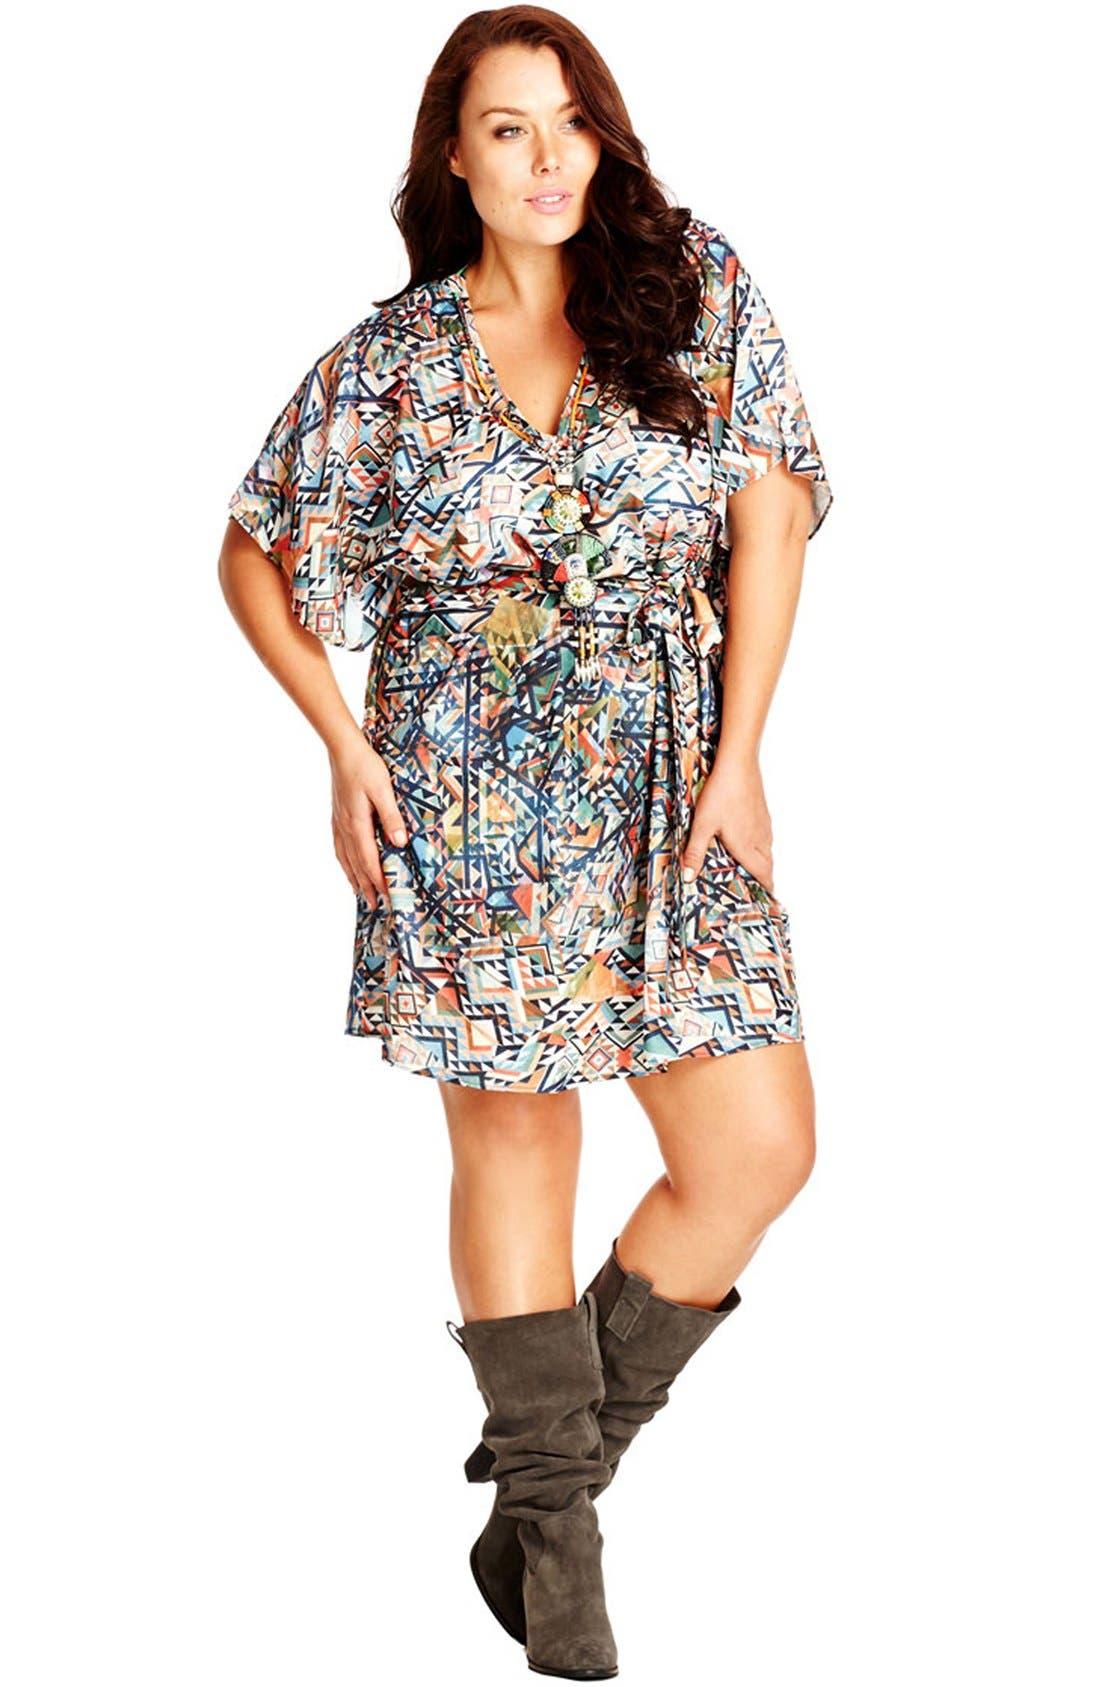 Alternate Image 1 Selected - City Chic Embellished Neck Geo Print Tunic Dress (Plus Size)